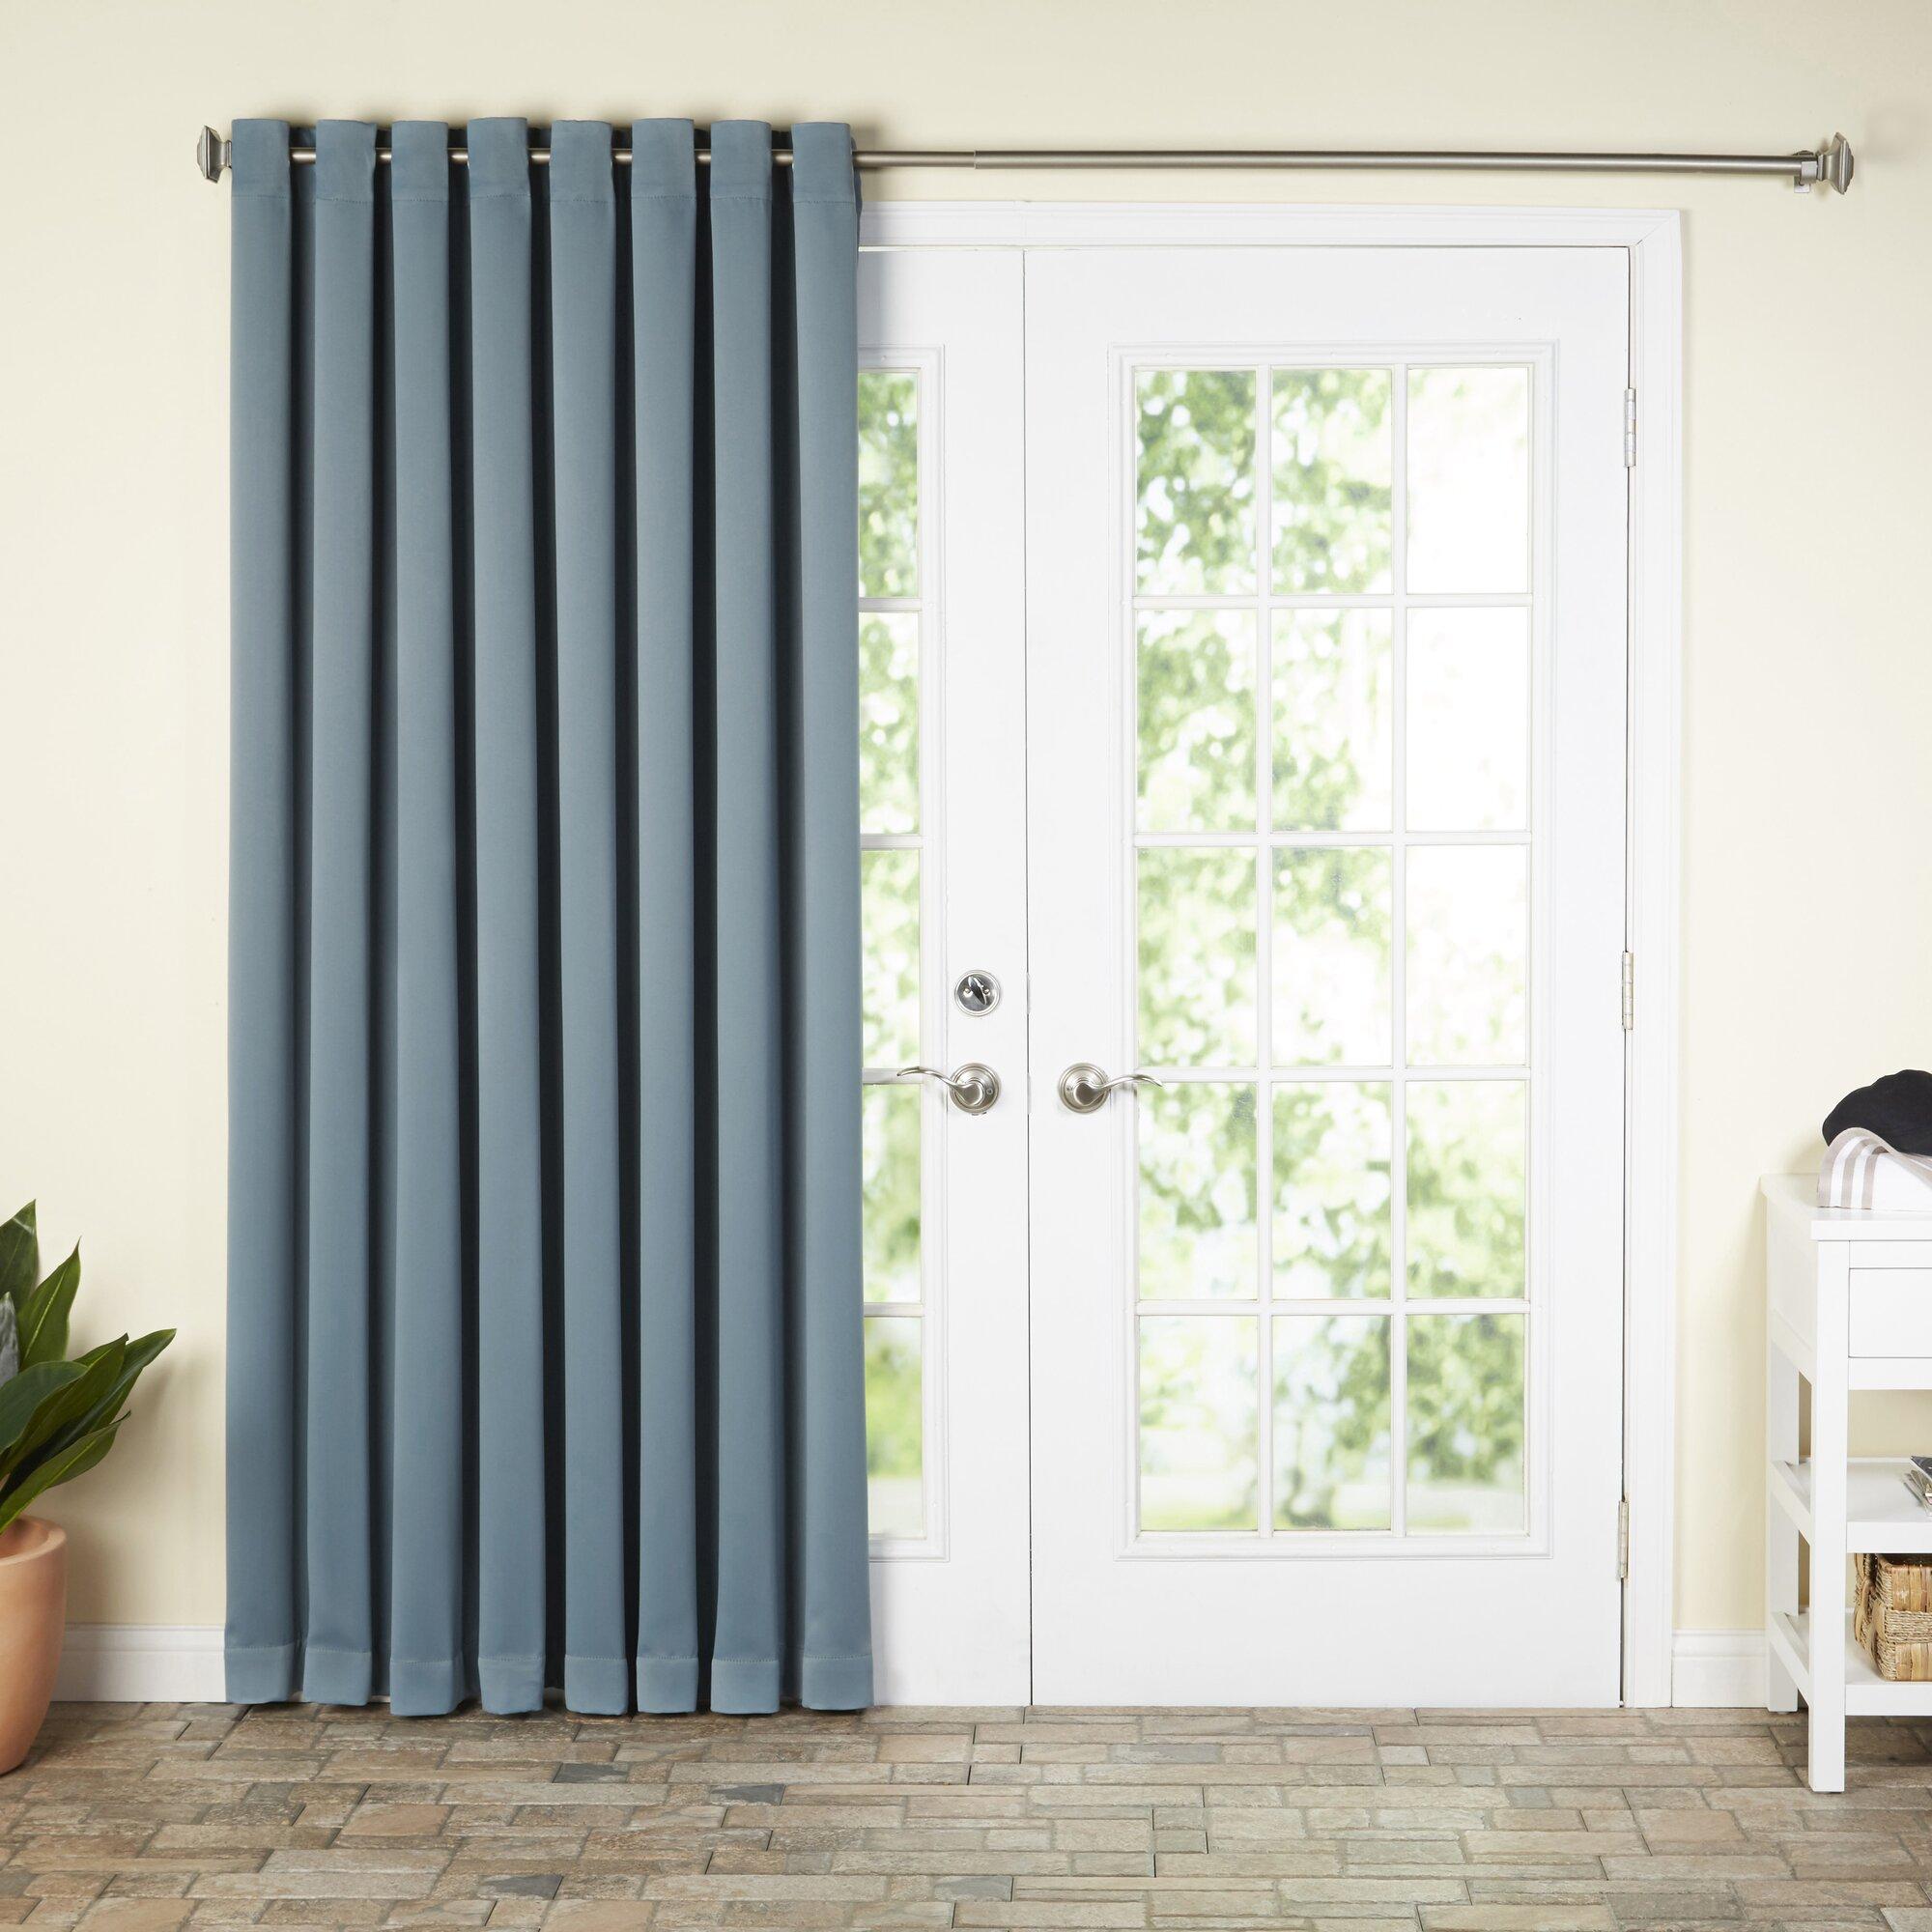 Curtains for patio doors - Curtains For Patio Doors 54